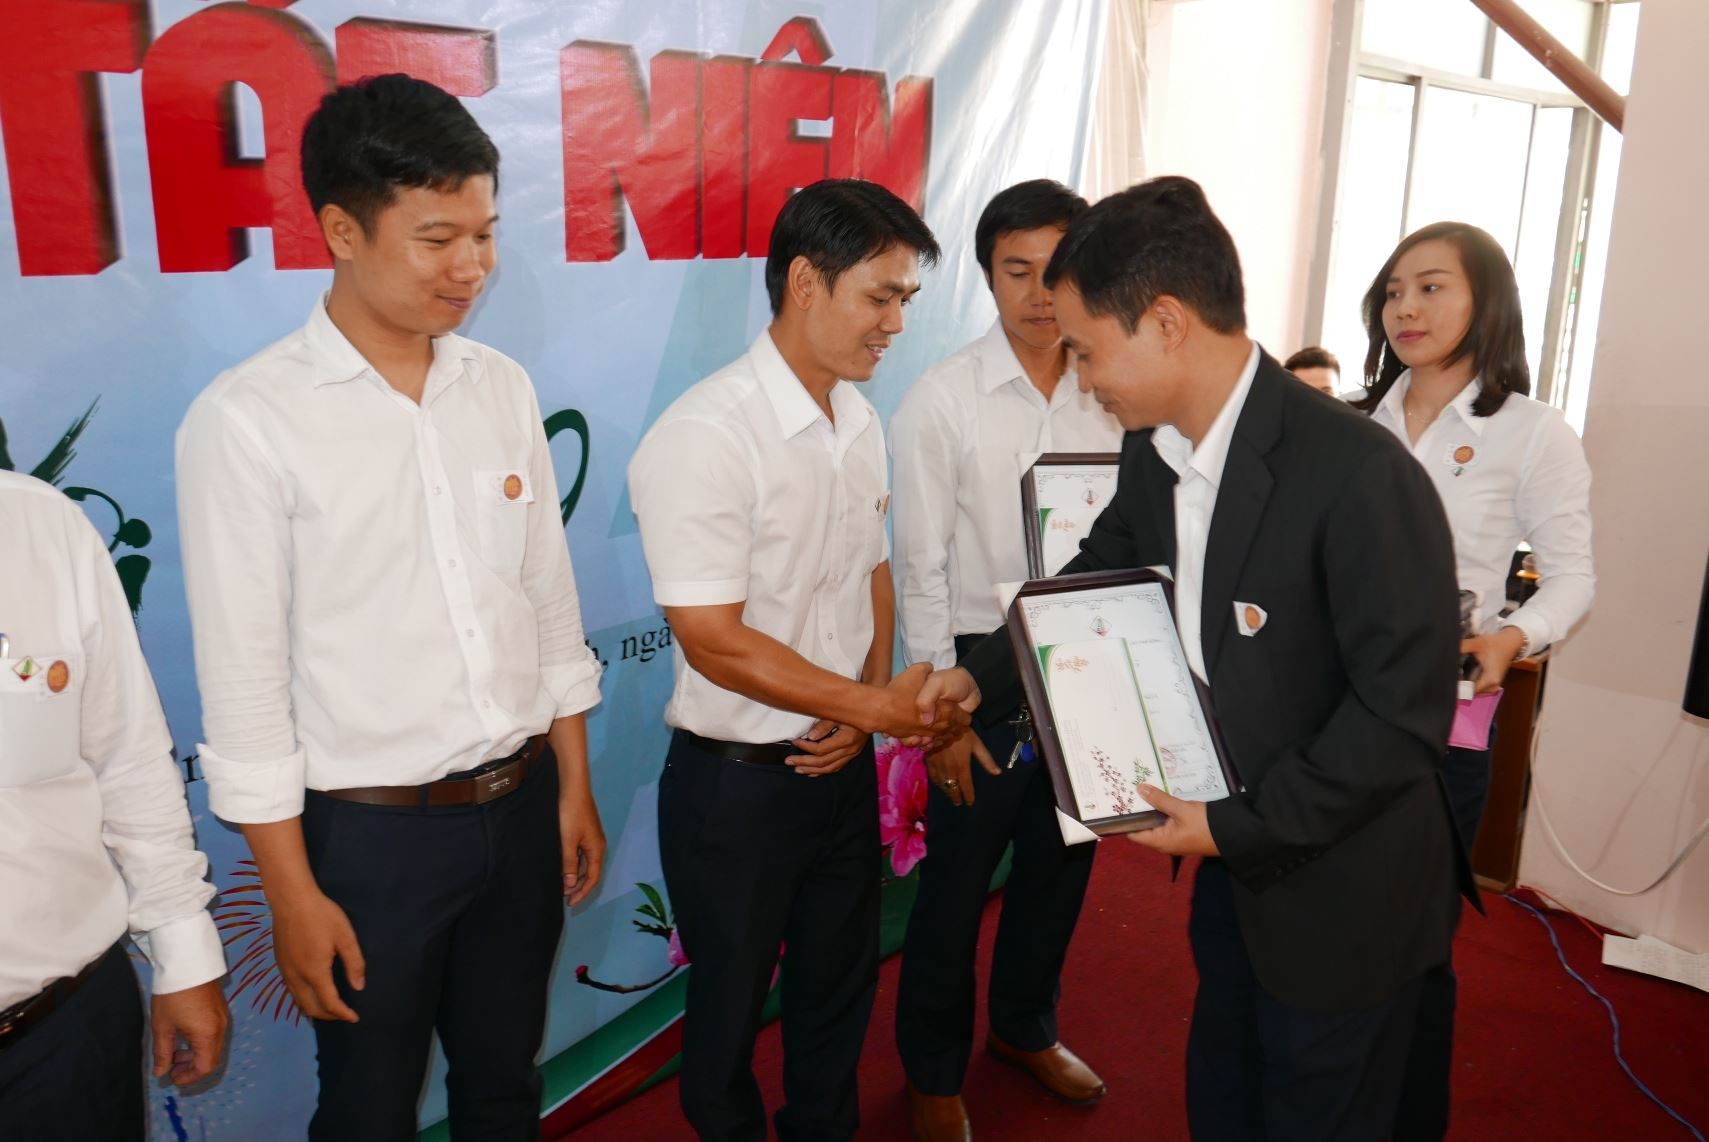 tat-nien-2019-cc1-mekong (13)